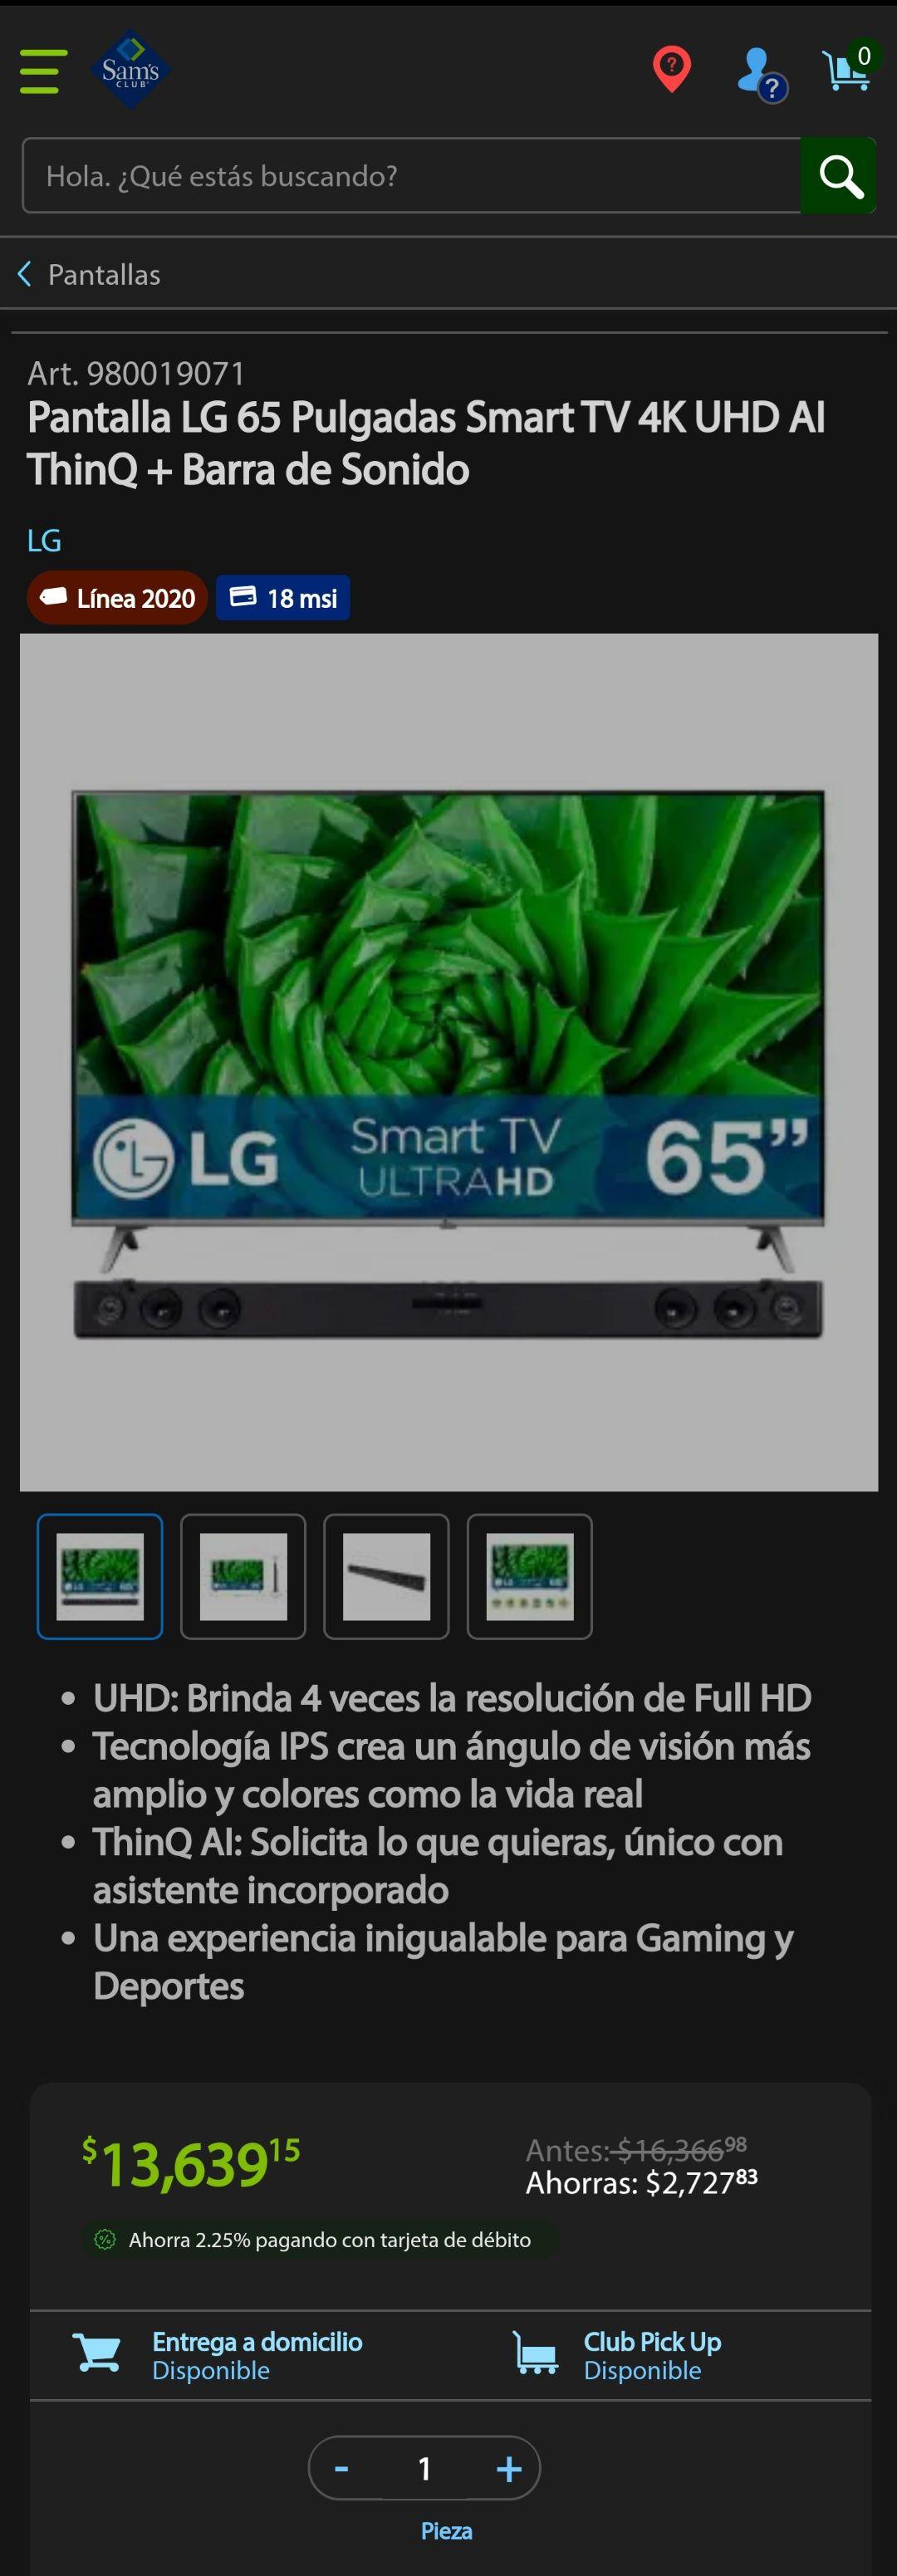 Sam's Club: Pantalla LG 65 Pulgadas Smart TV 4K UHD AI ThinQ + Barra de Sonido con banorte